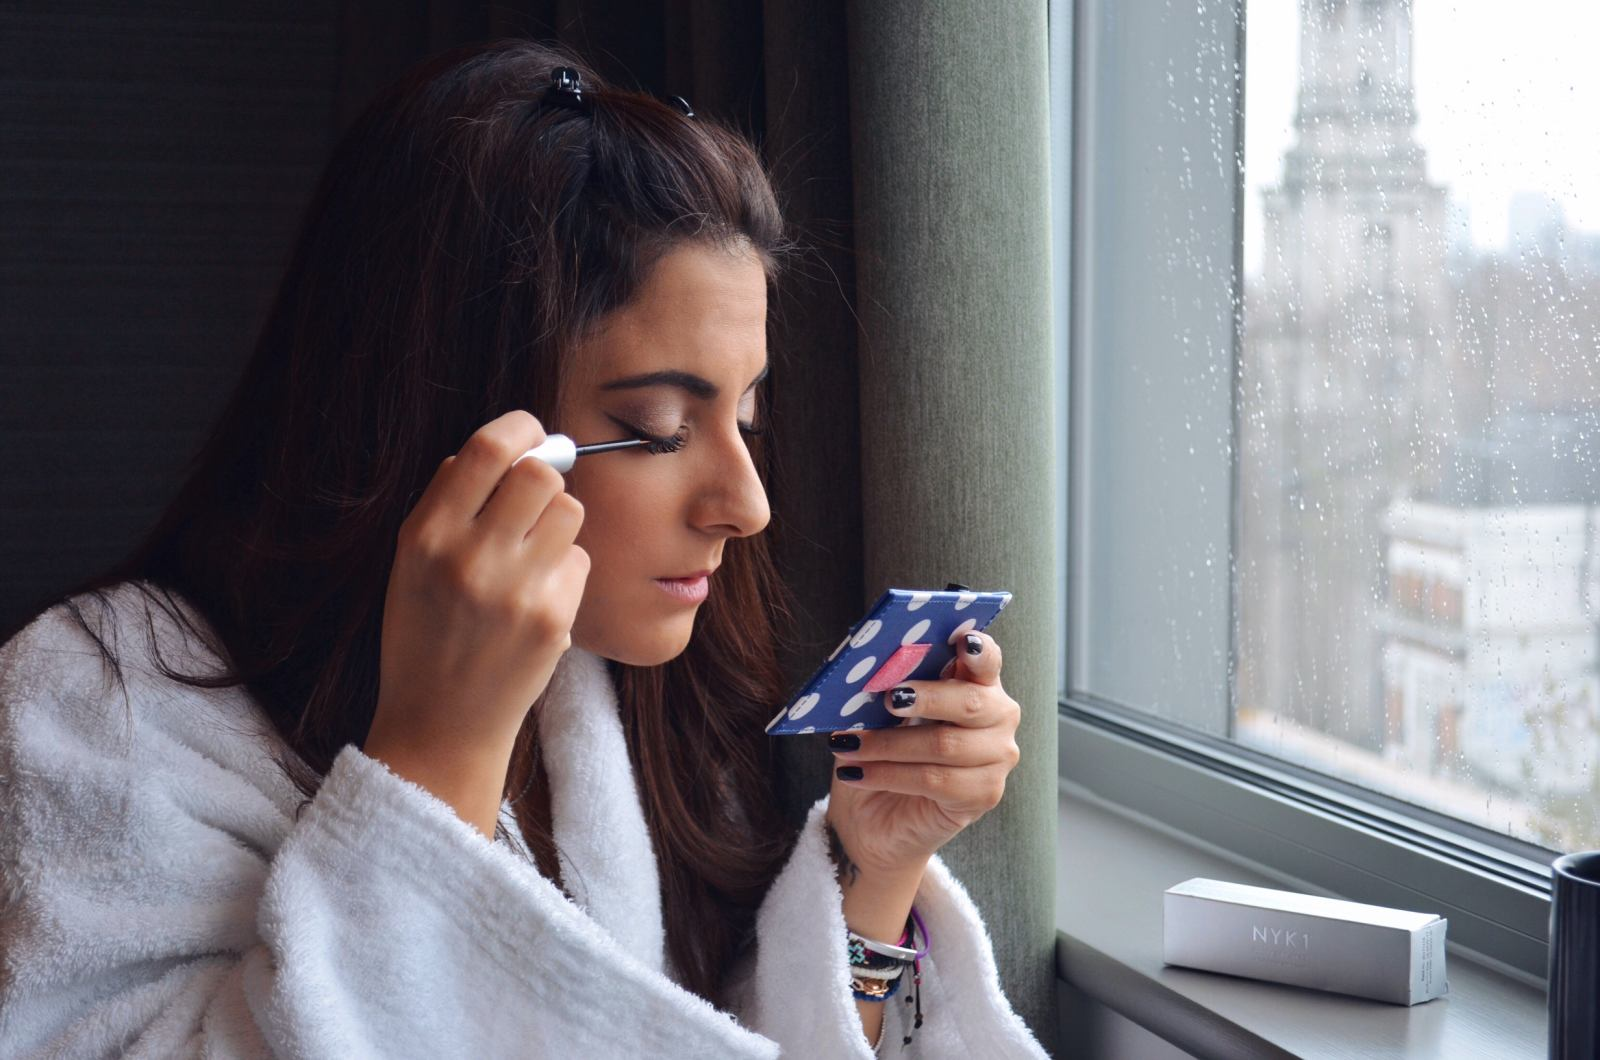 nyk1-lash-force-eyelash-growth-serum-beauty-blog